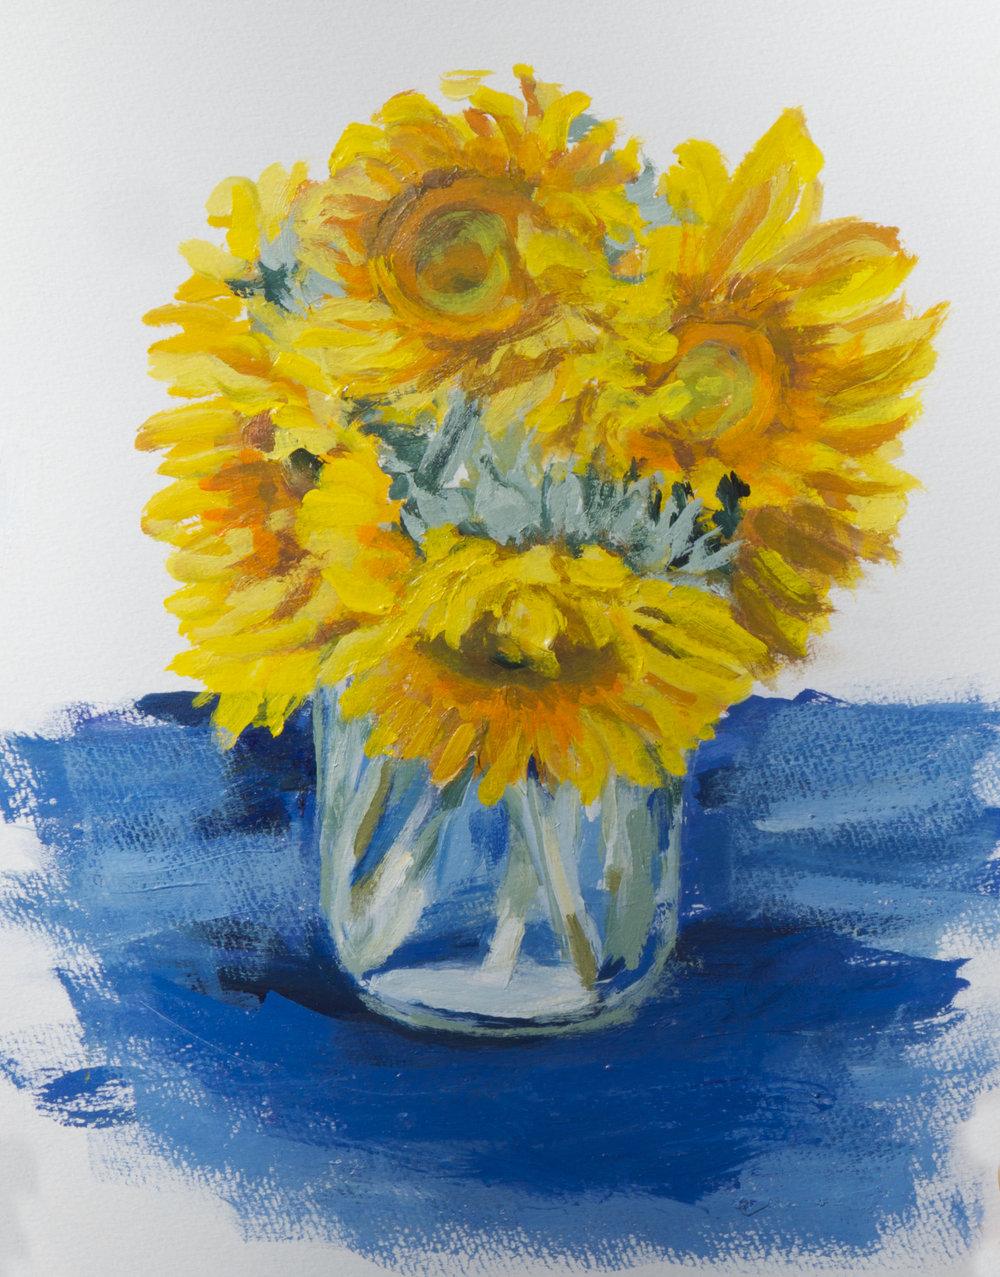 Sunflowers in Jar